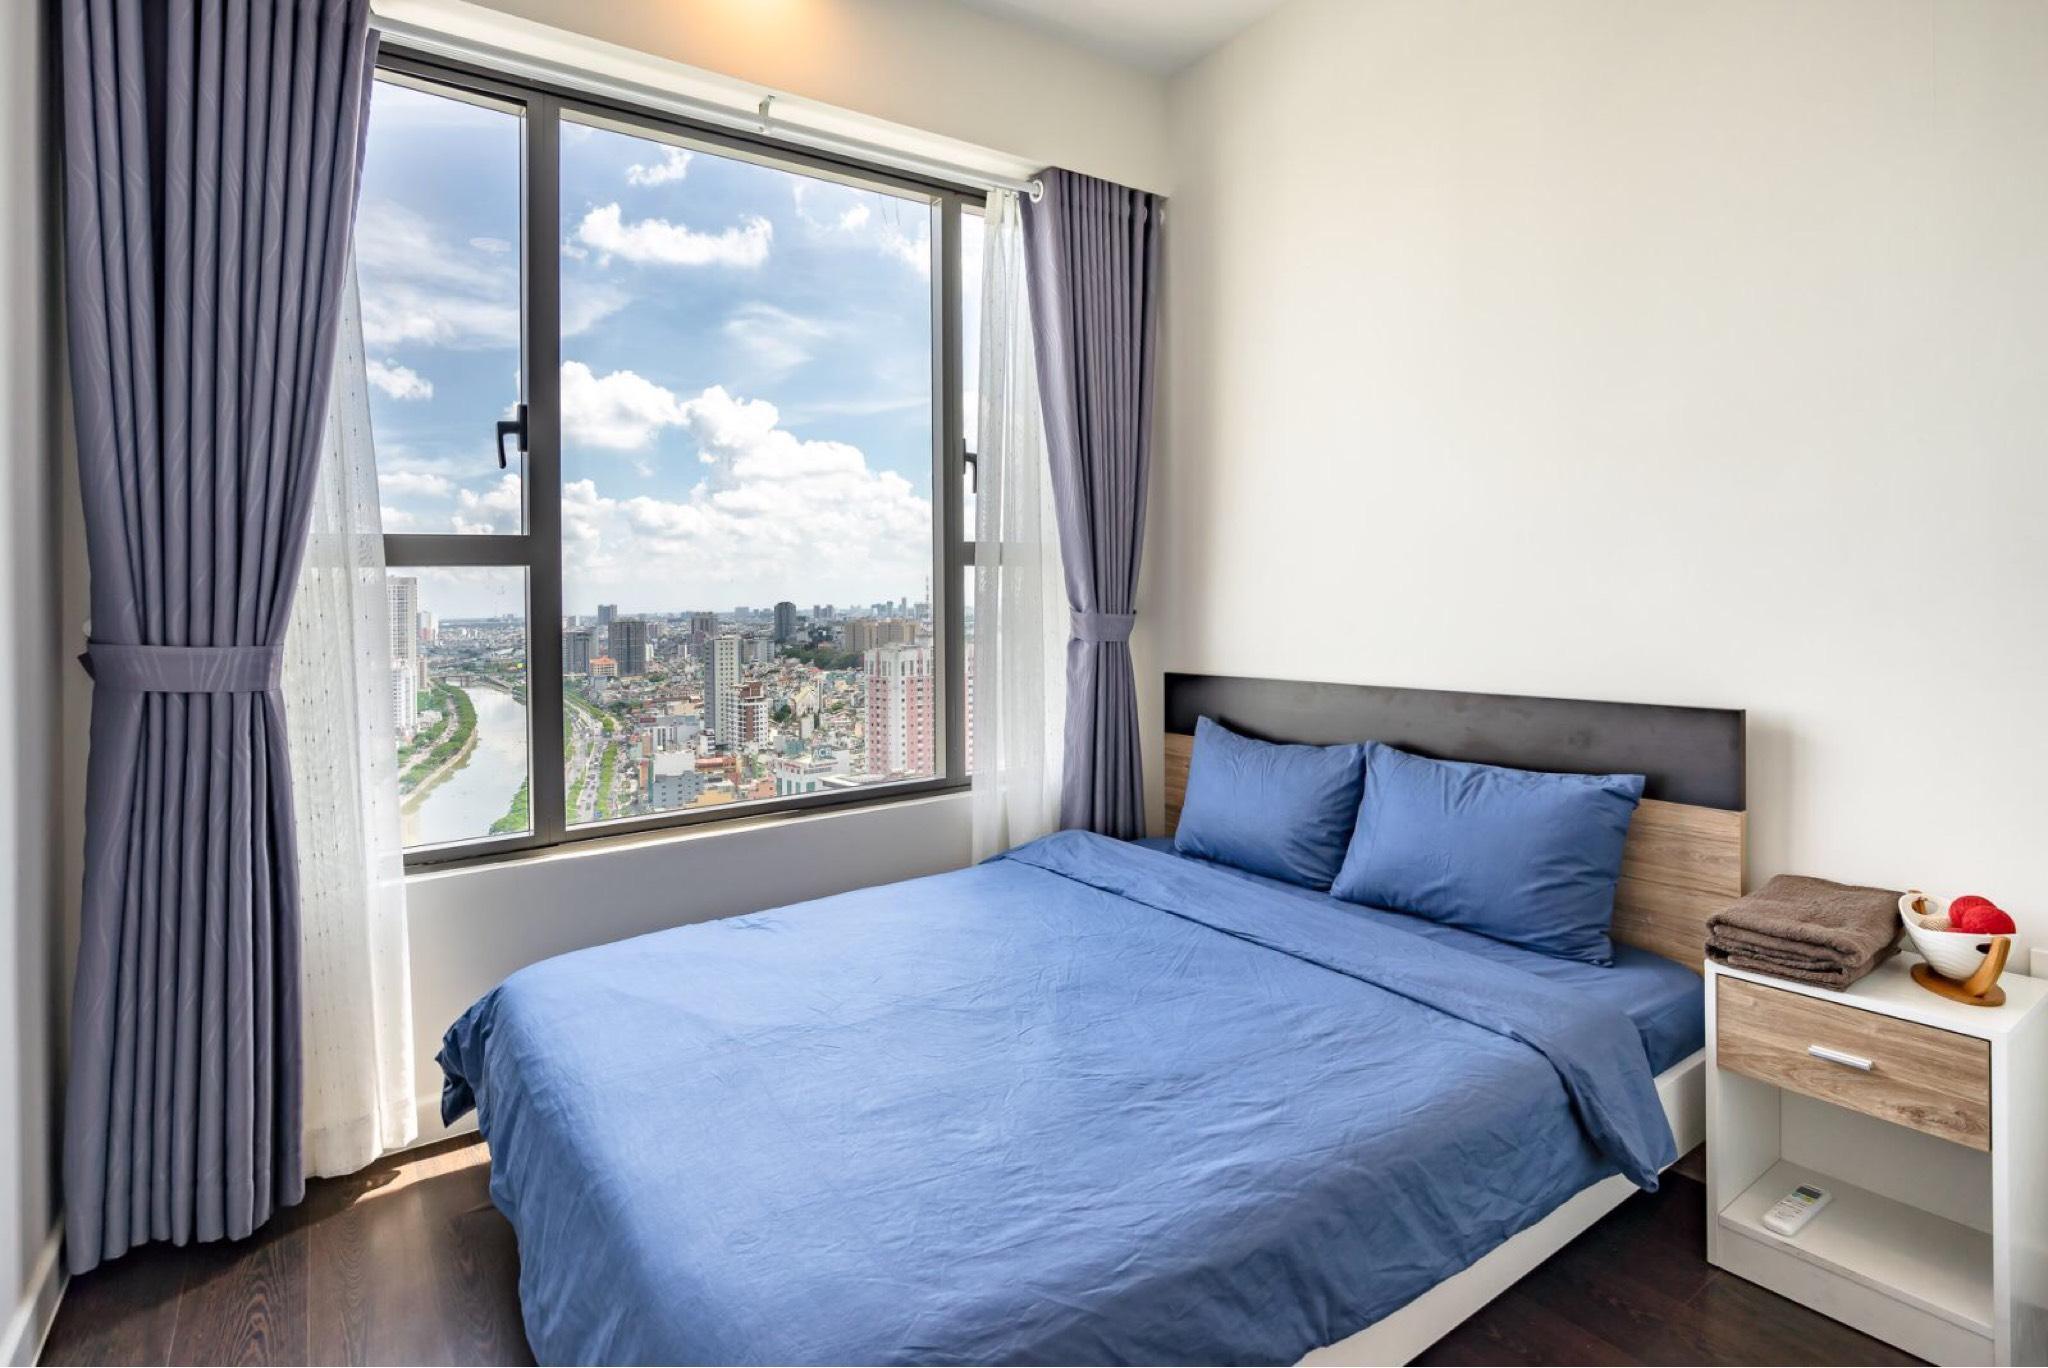 Apartment Near Ben Thanh 3BRs